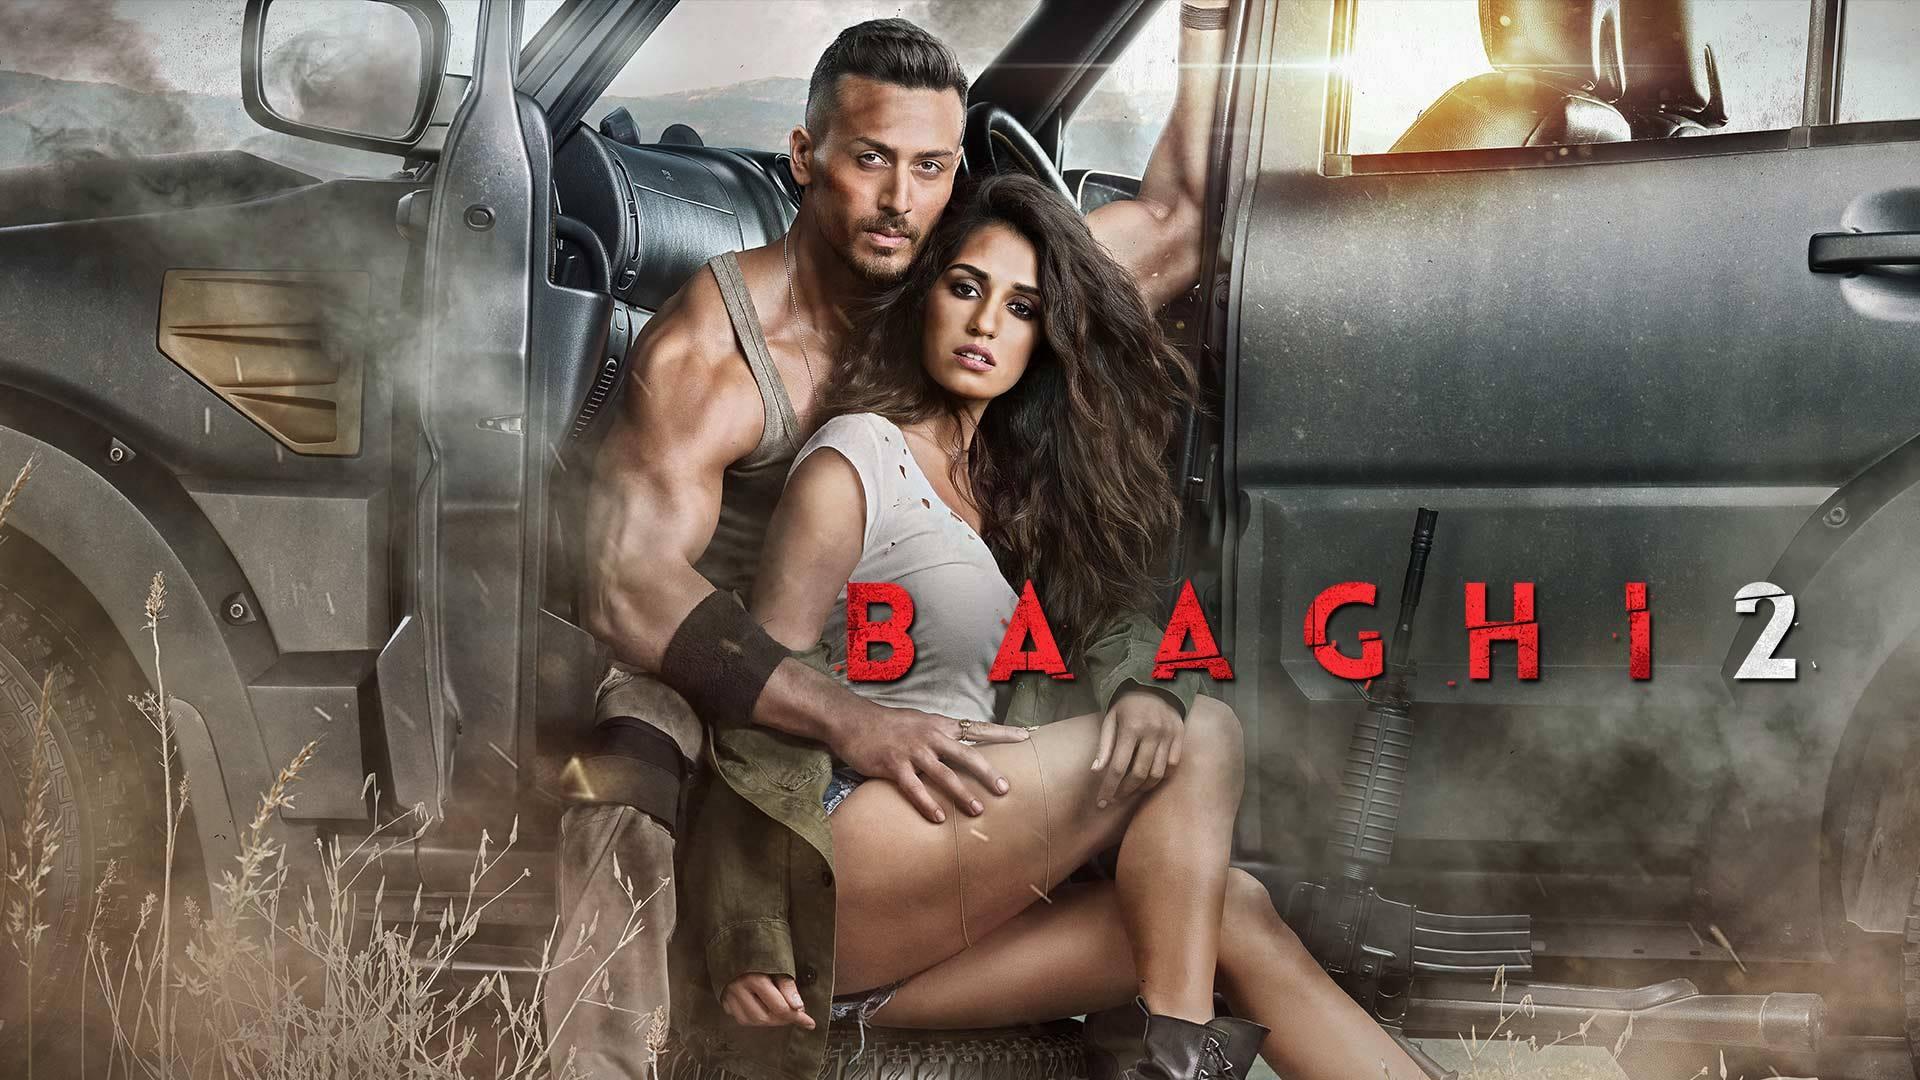 Baaghi-2-movie